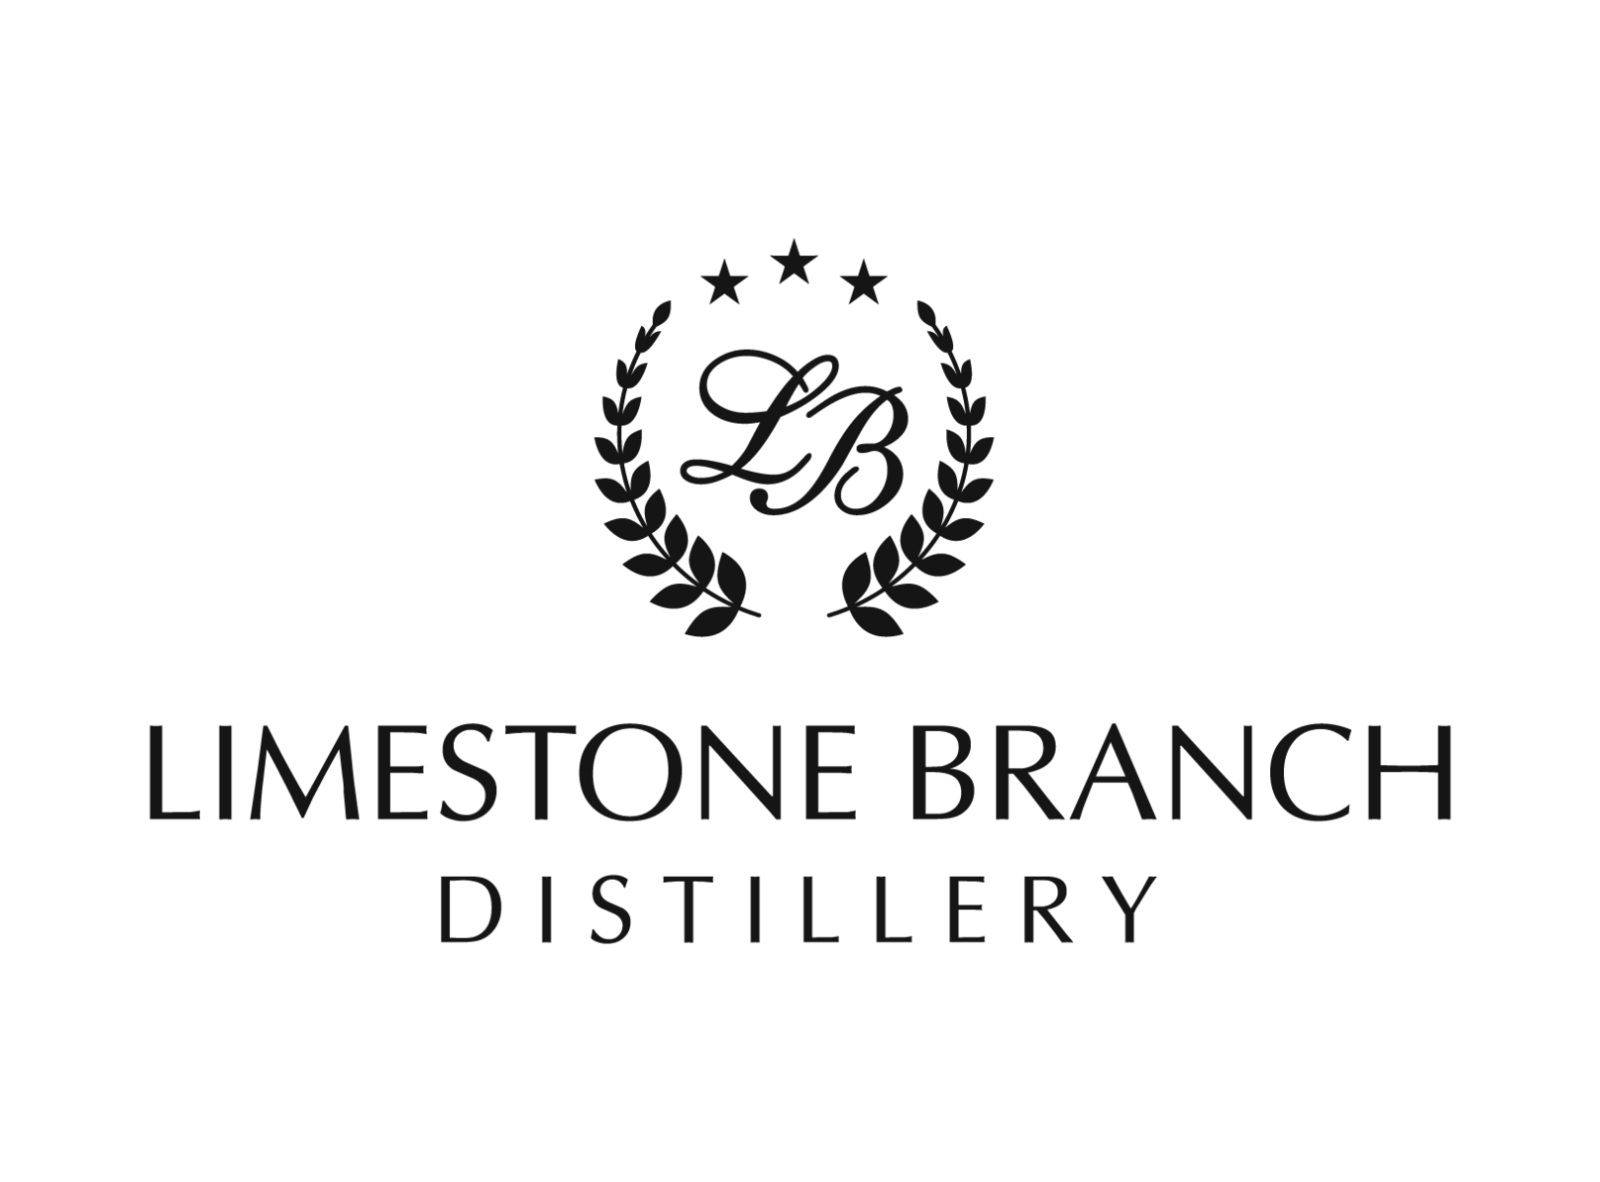 Limestone Branch